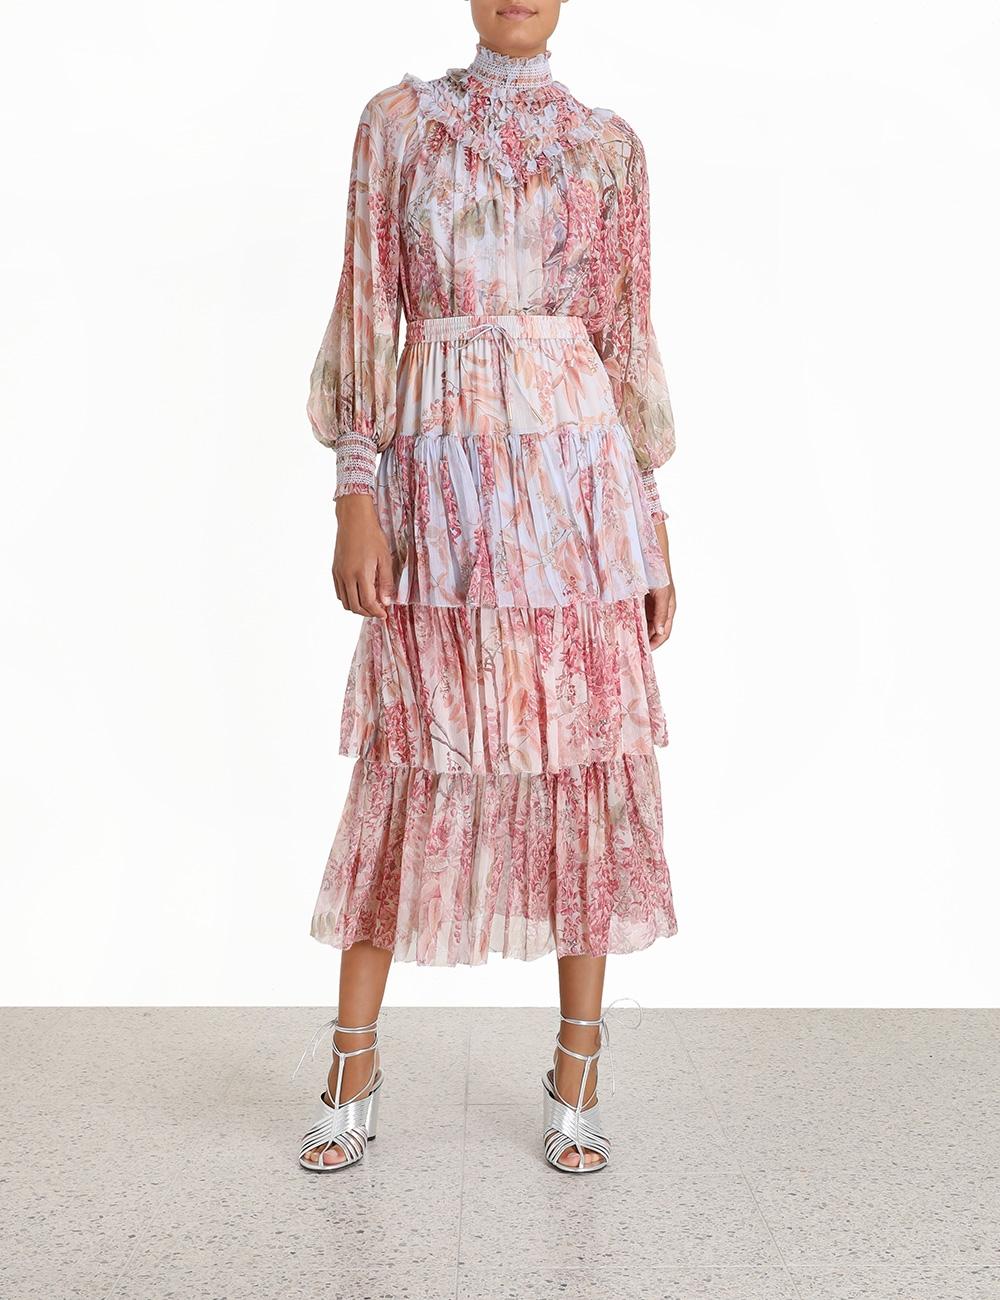 Botanica Tiered Skirt